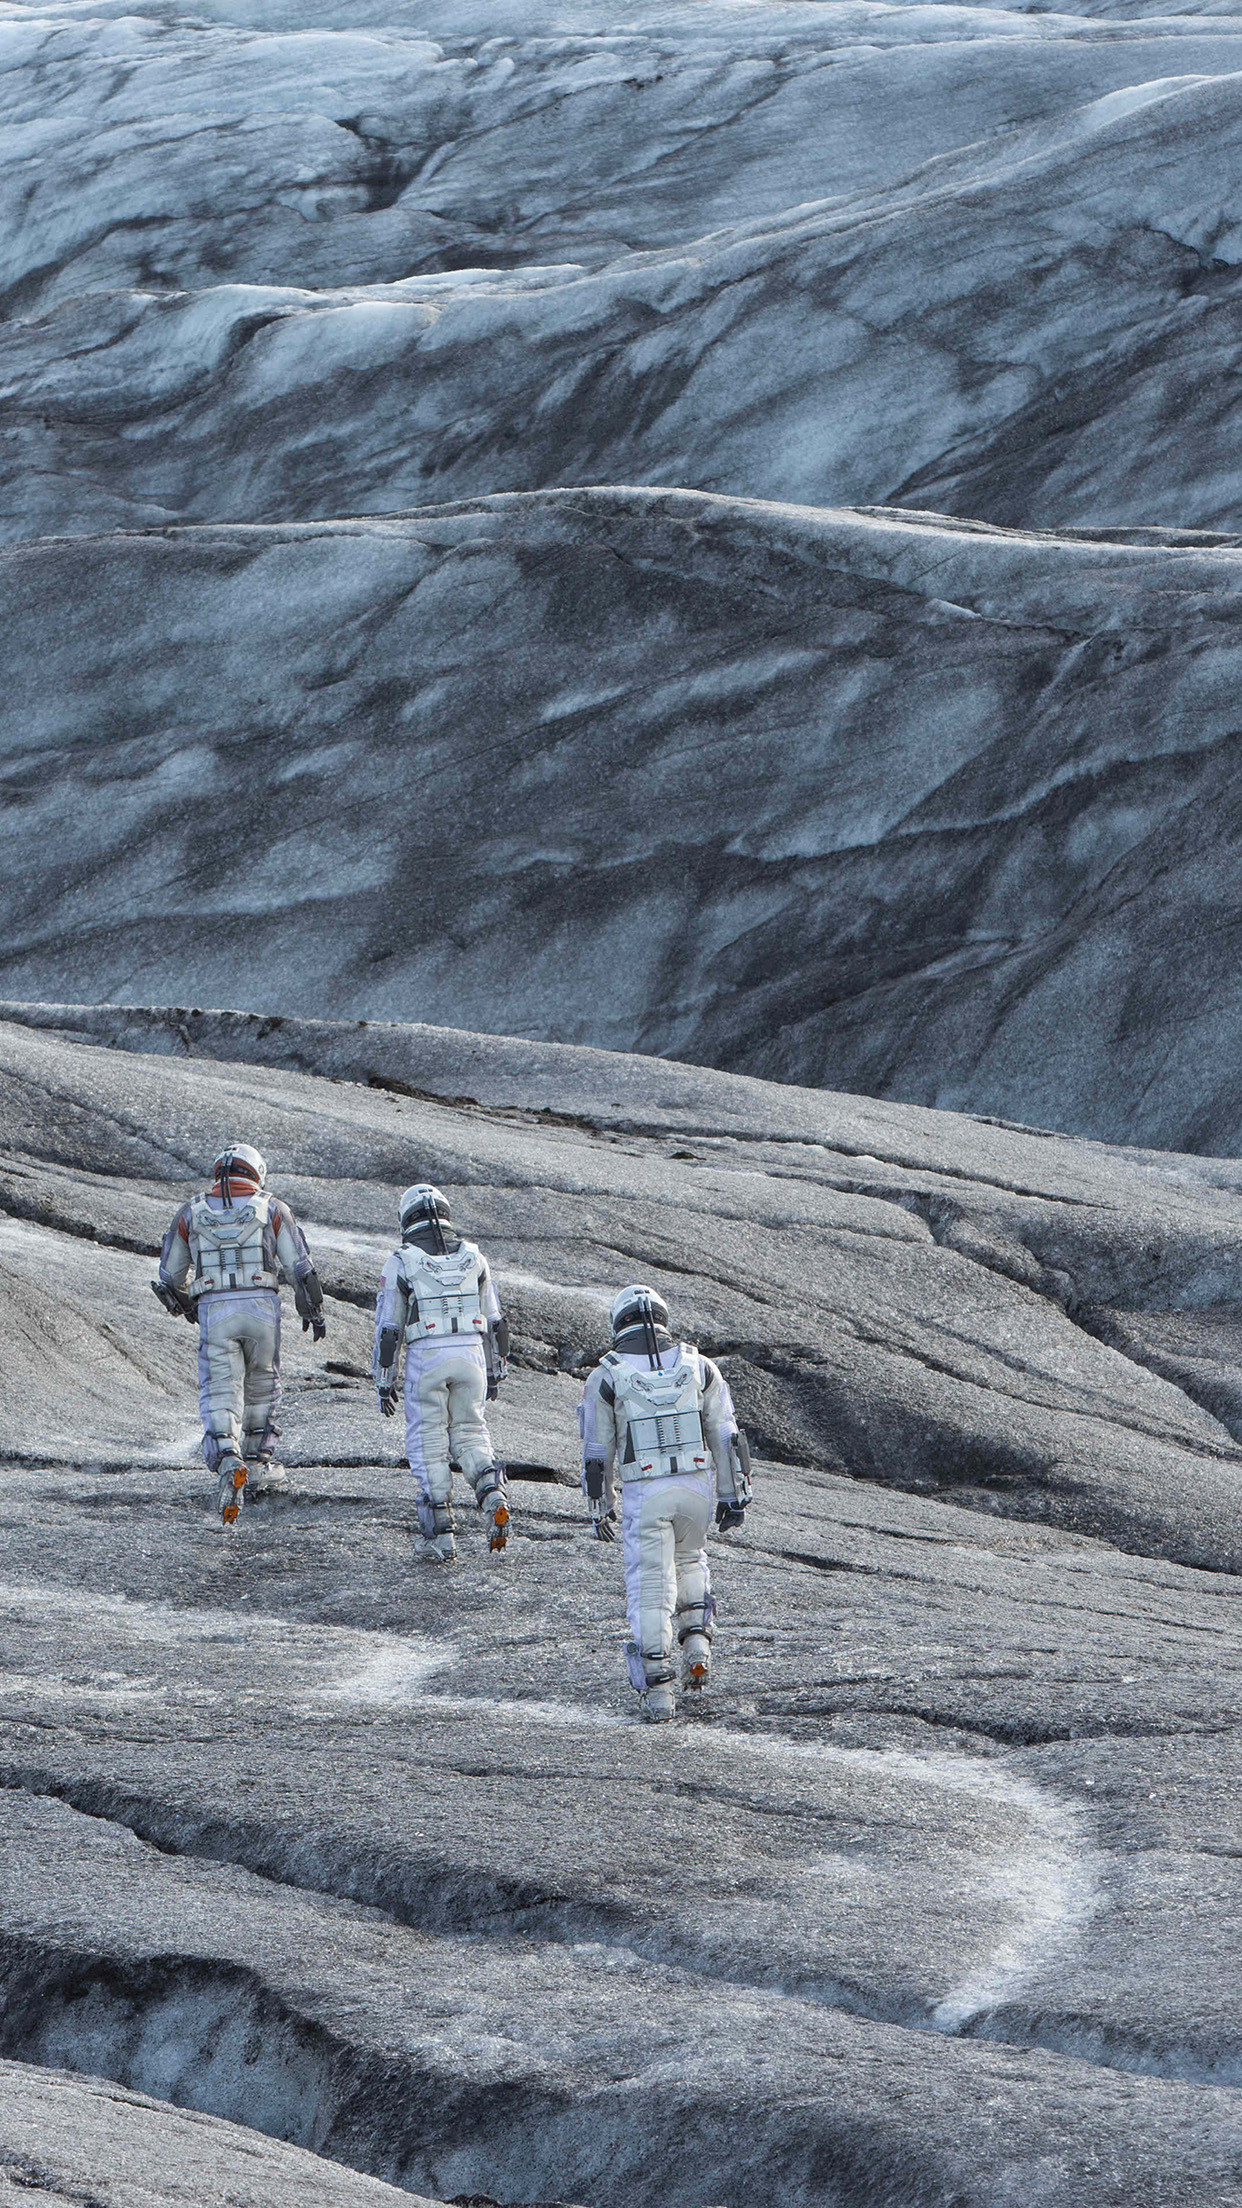 mann-interstellar-space-film-planet-34-iphone6-plus-